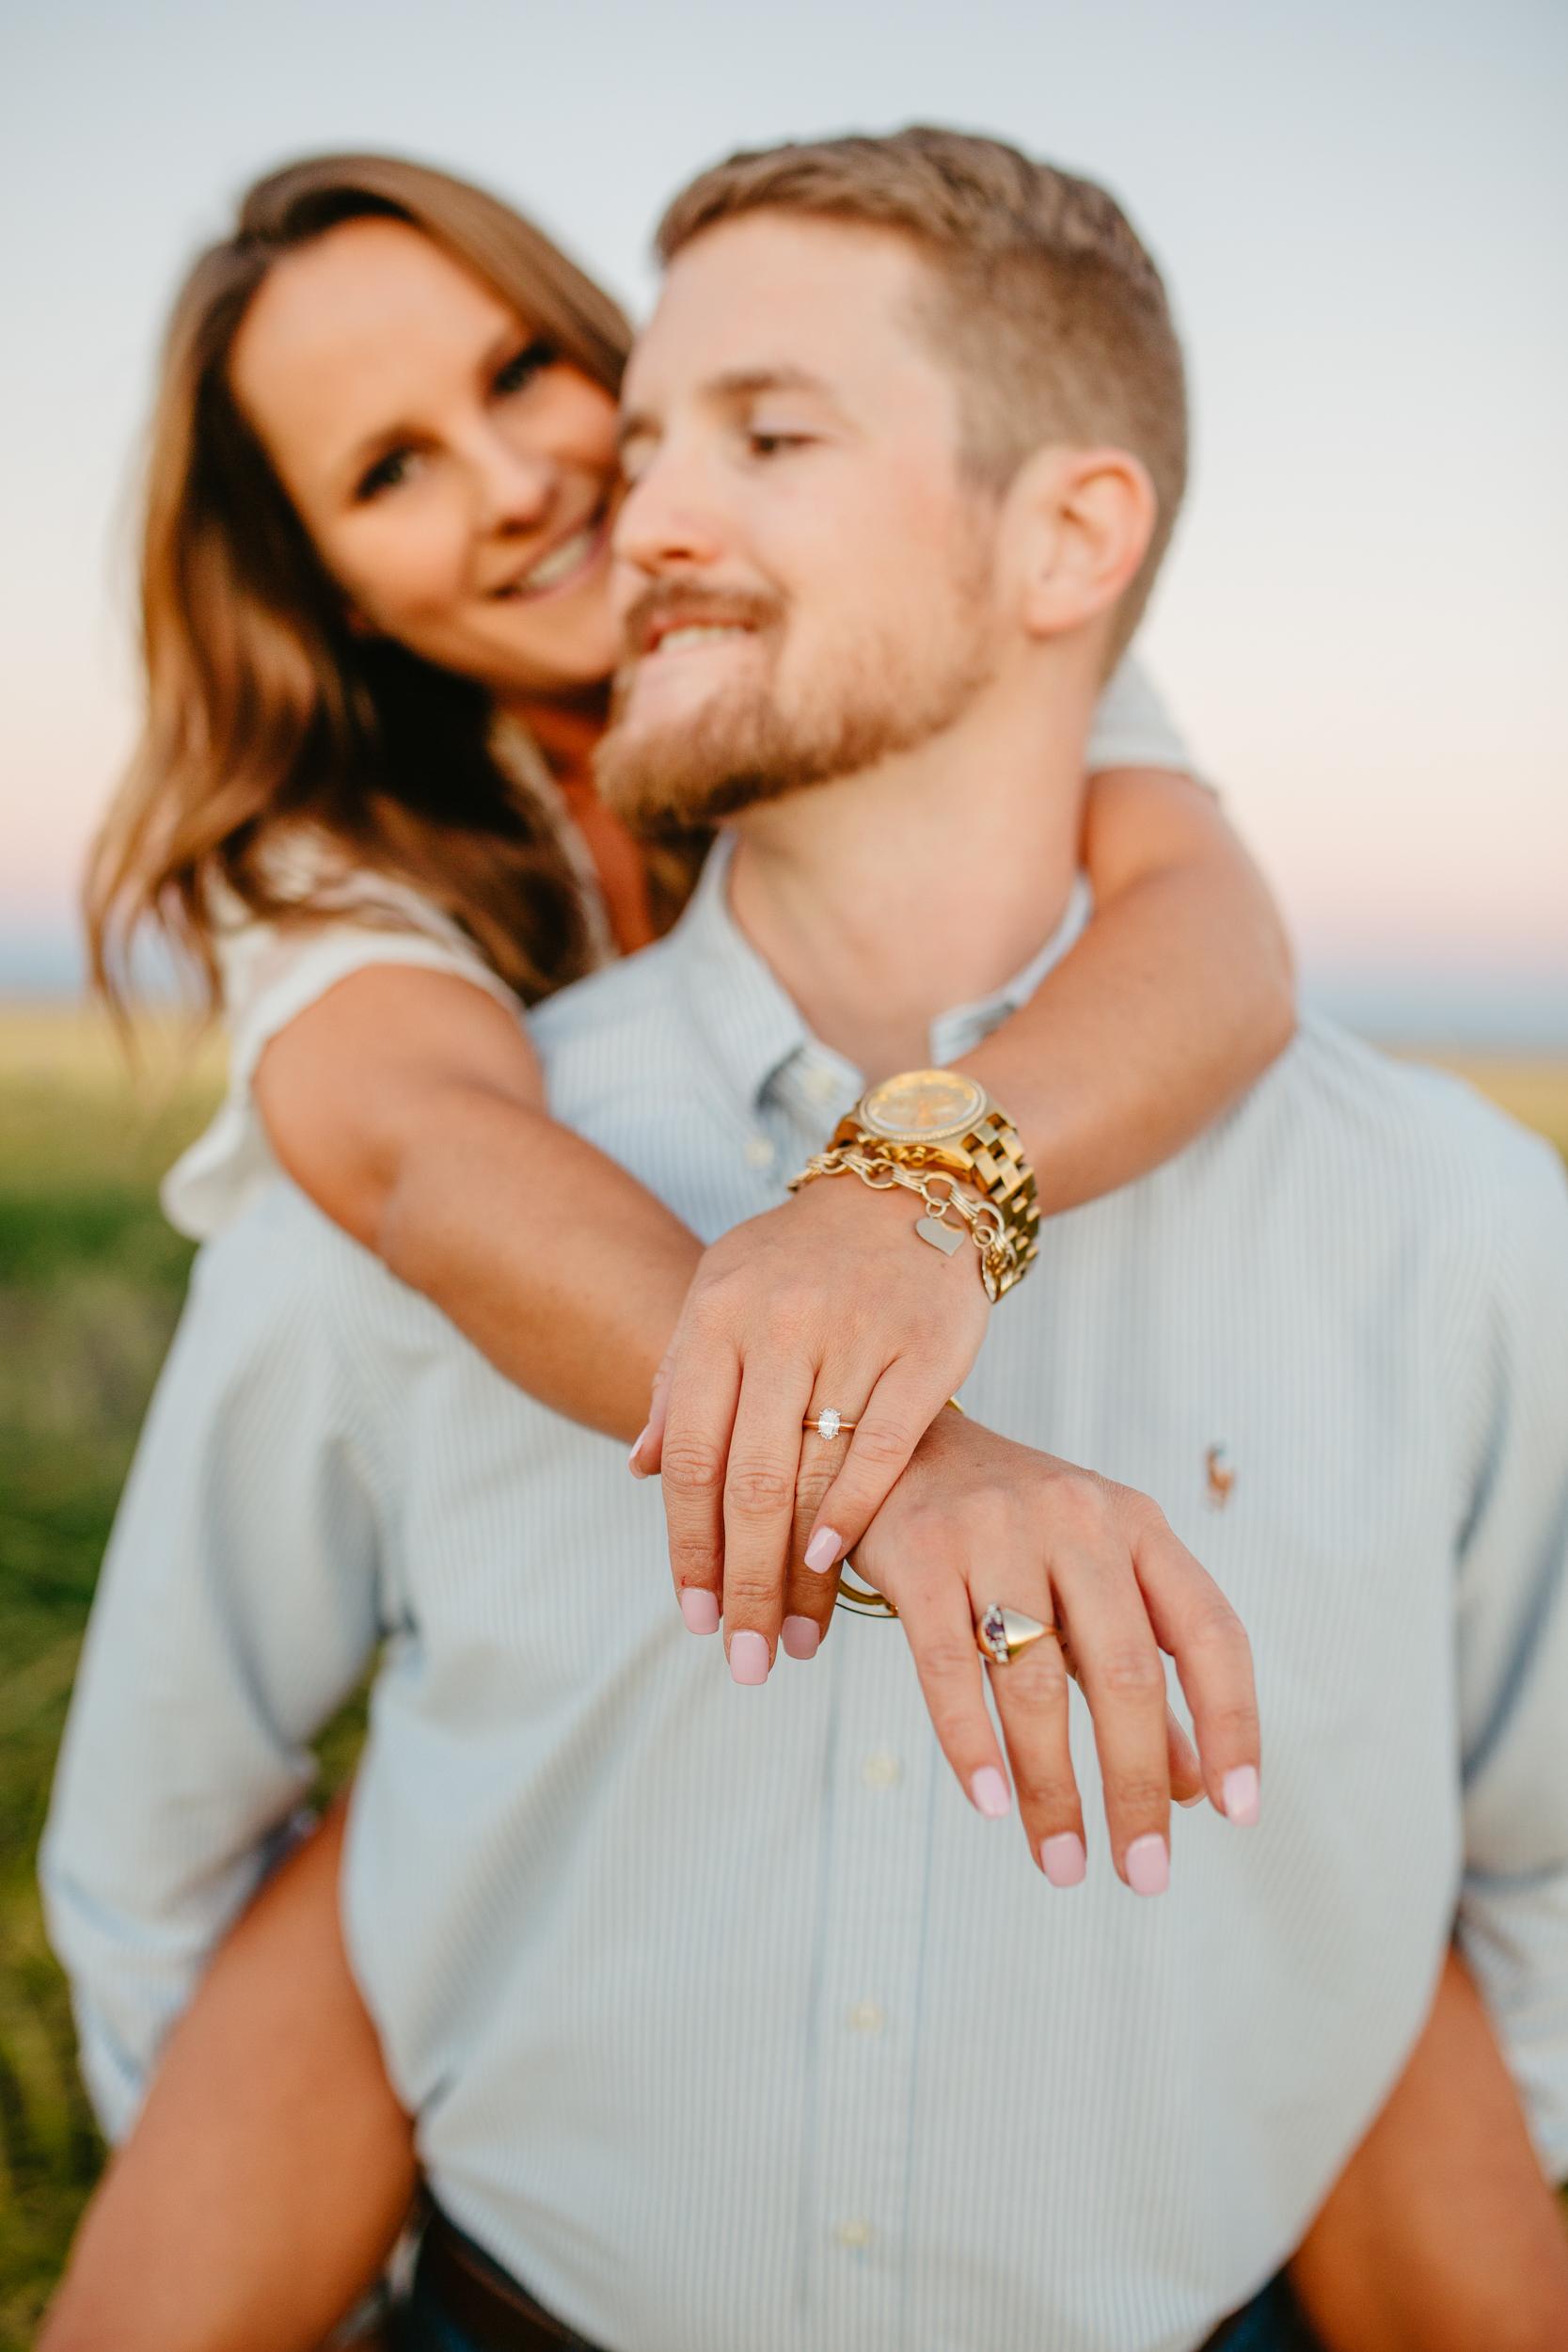 Engagement Photos-Ranalla Photo and Films-111.jpg